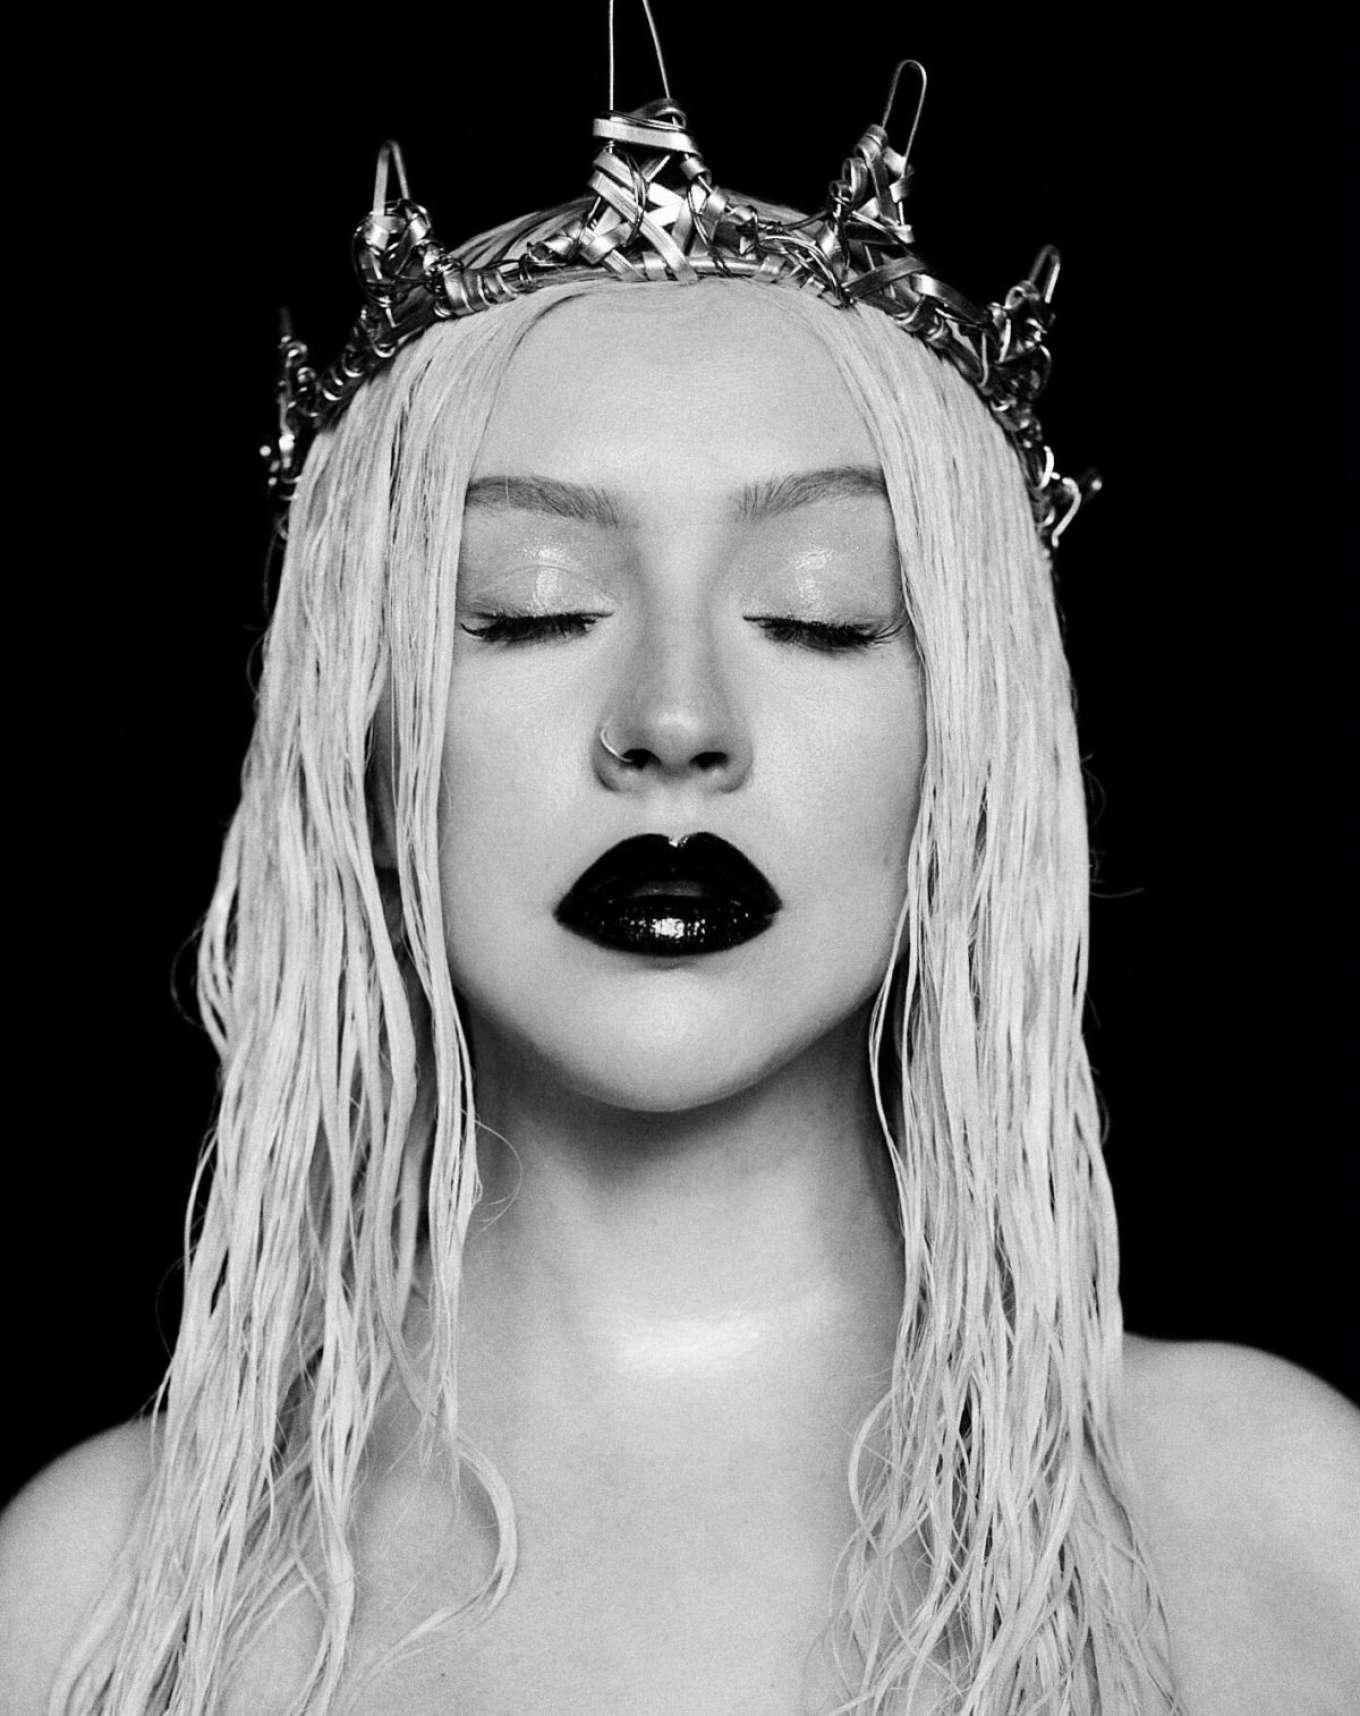 Christina Aguilera 2018 : Christina Aguilera: Liberation Tour Photoshoots 2018 -09